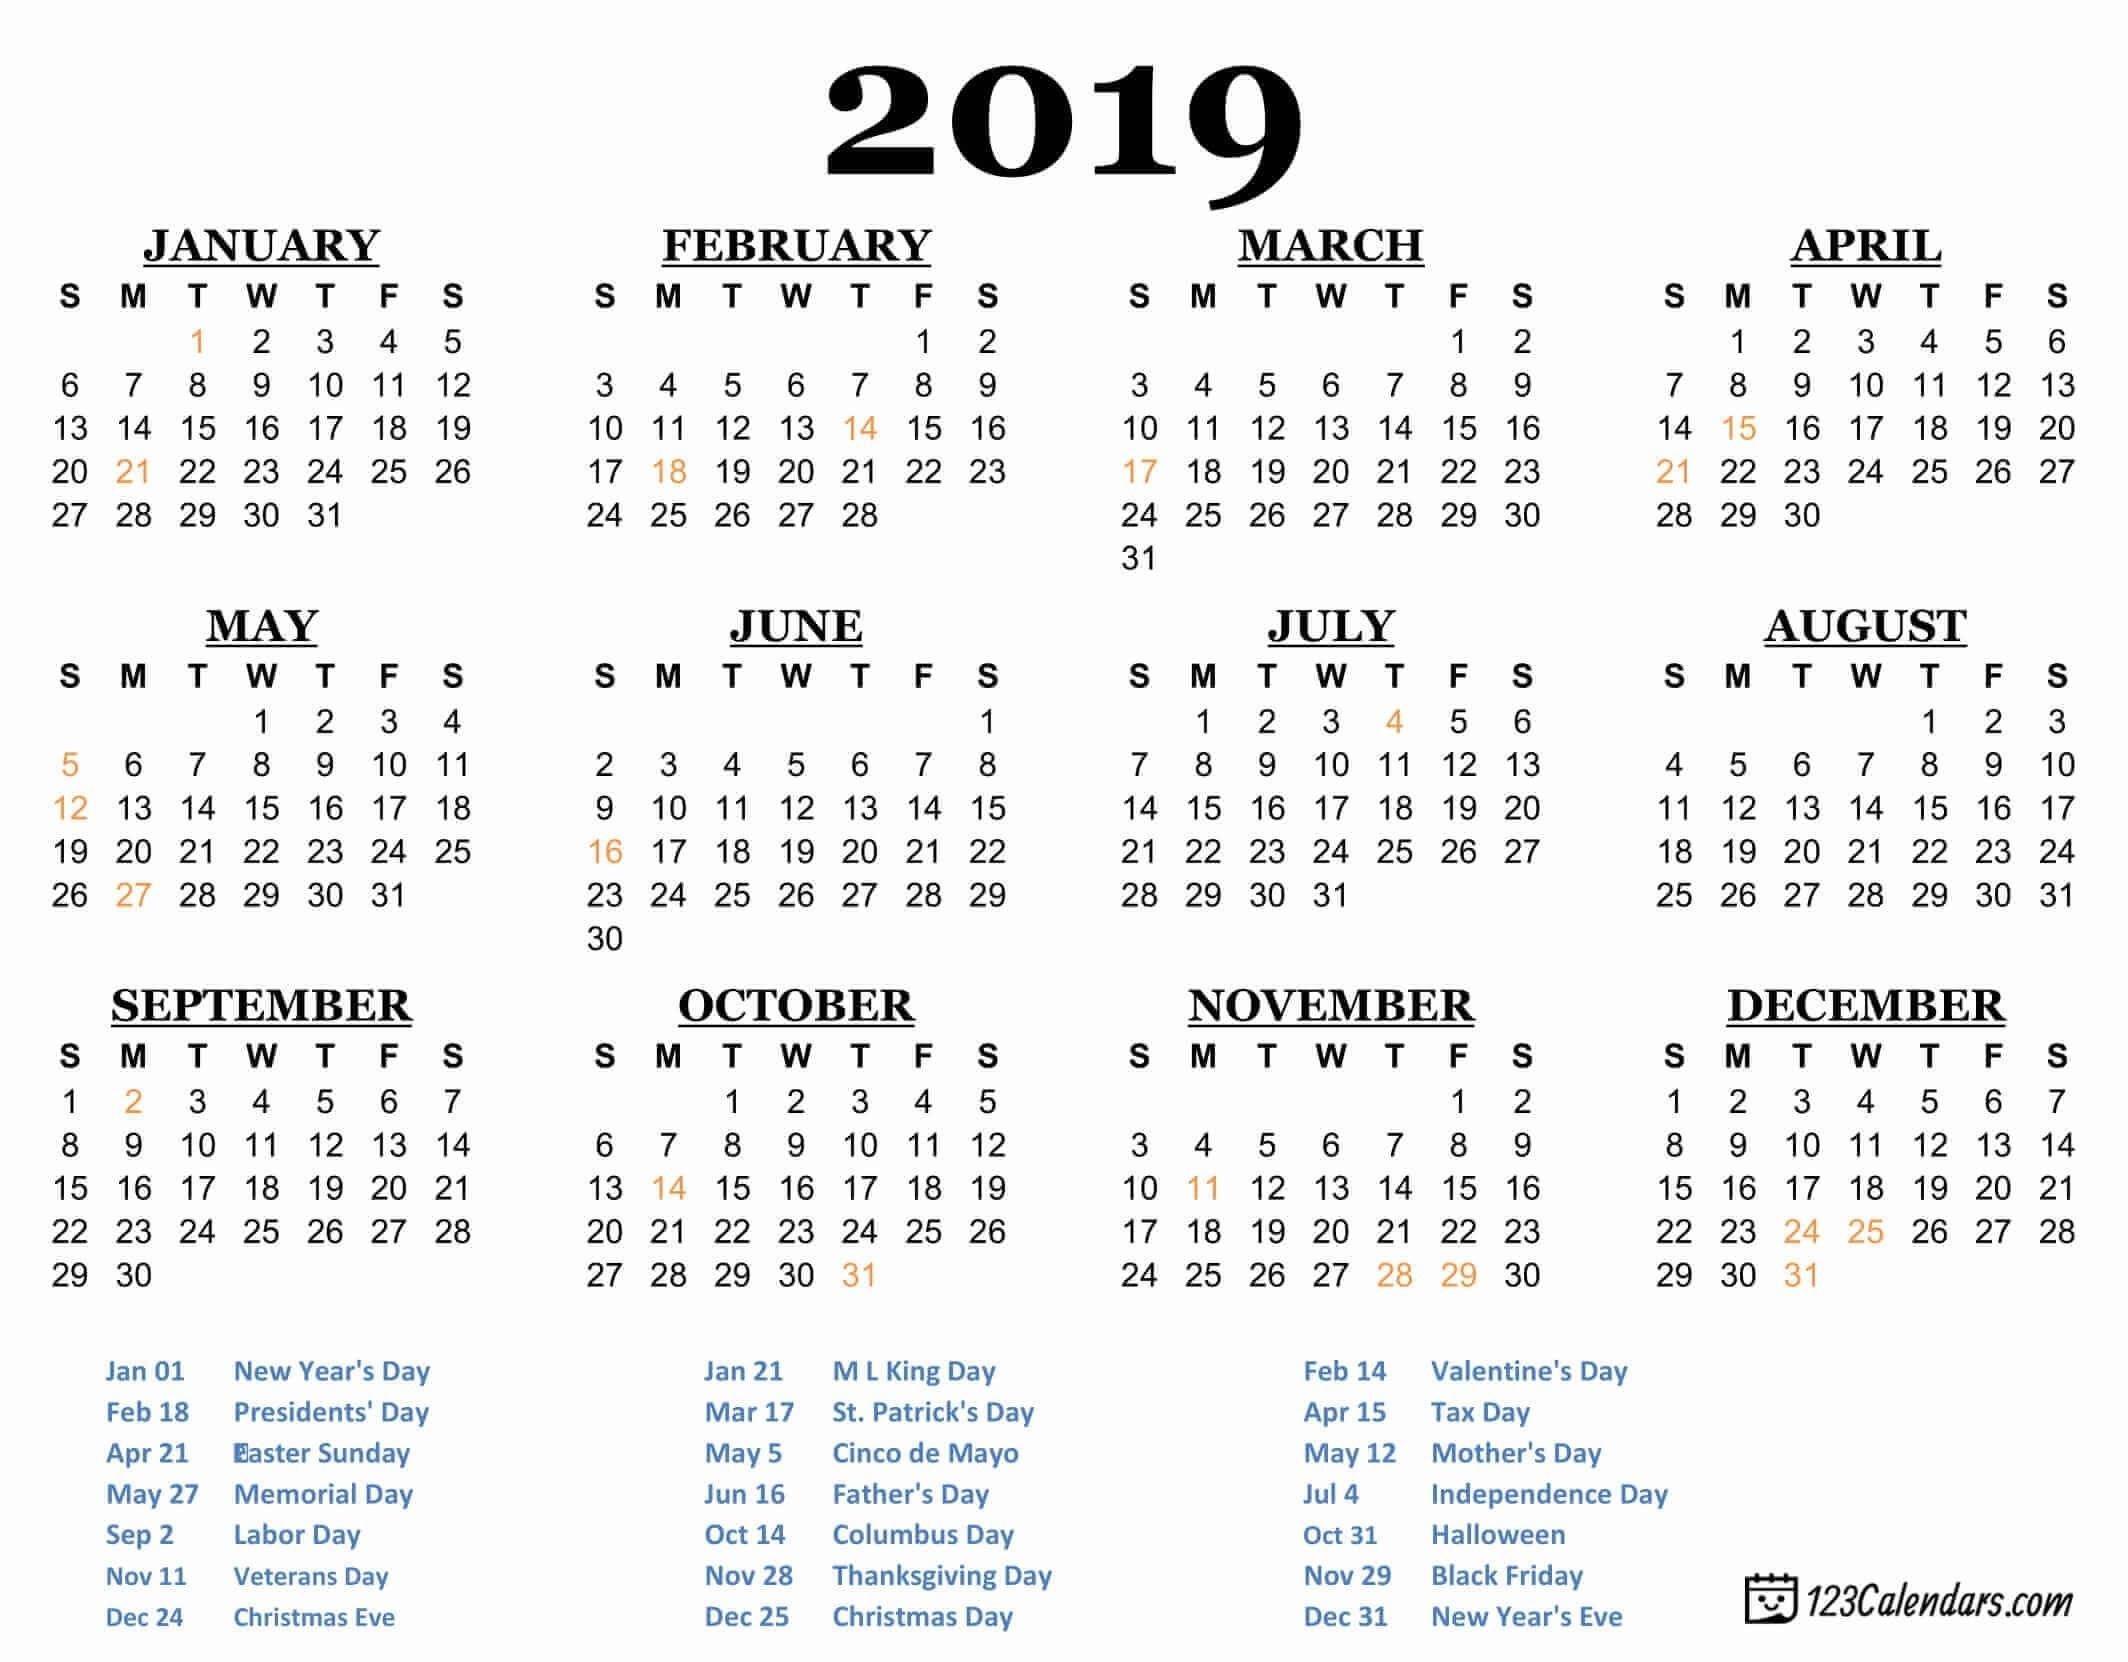 2019 Printable Calendar – 123Calendars Picture Of A 2019 Calendar